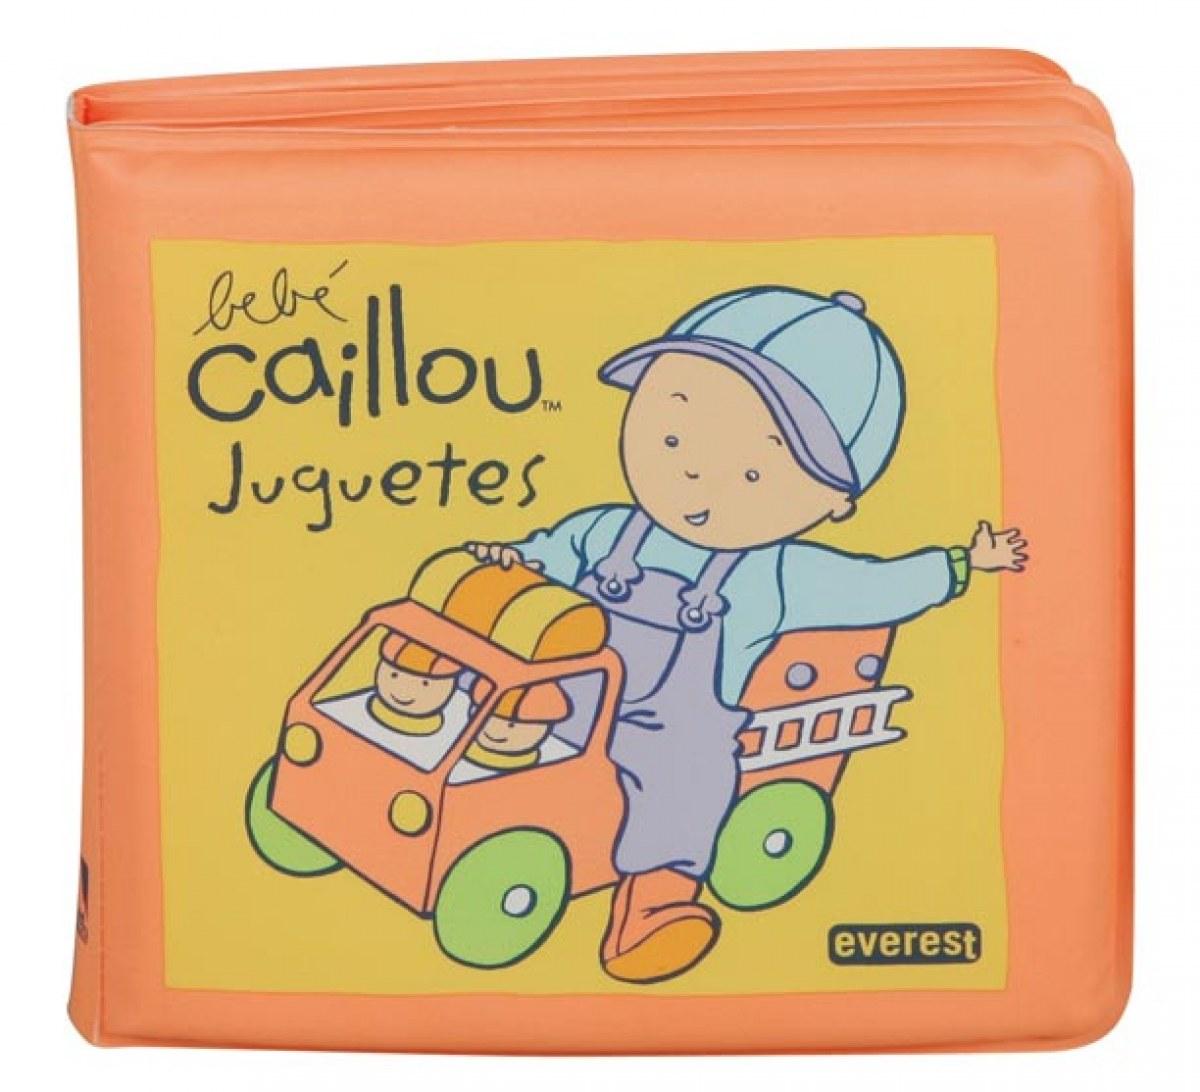 Caillo En El Bano.Bebe Caillou Juguetes Libro Para Bano Aa Vv Imosver